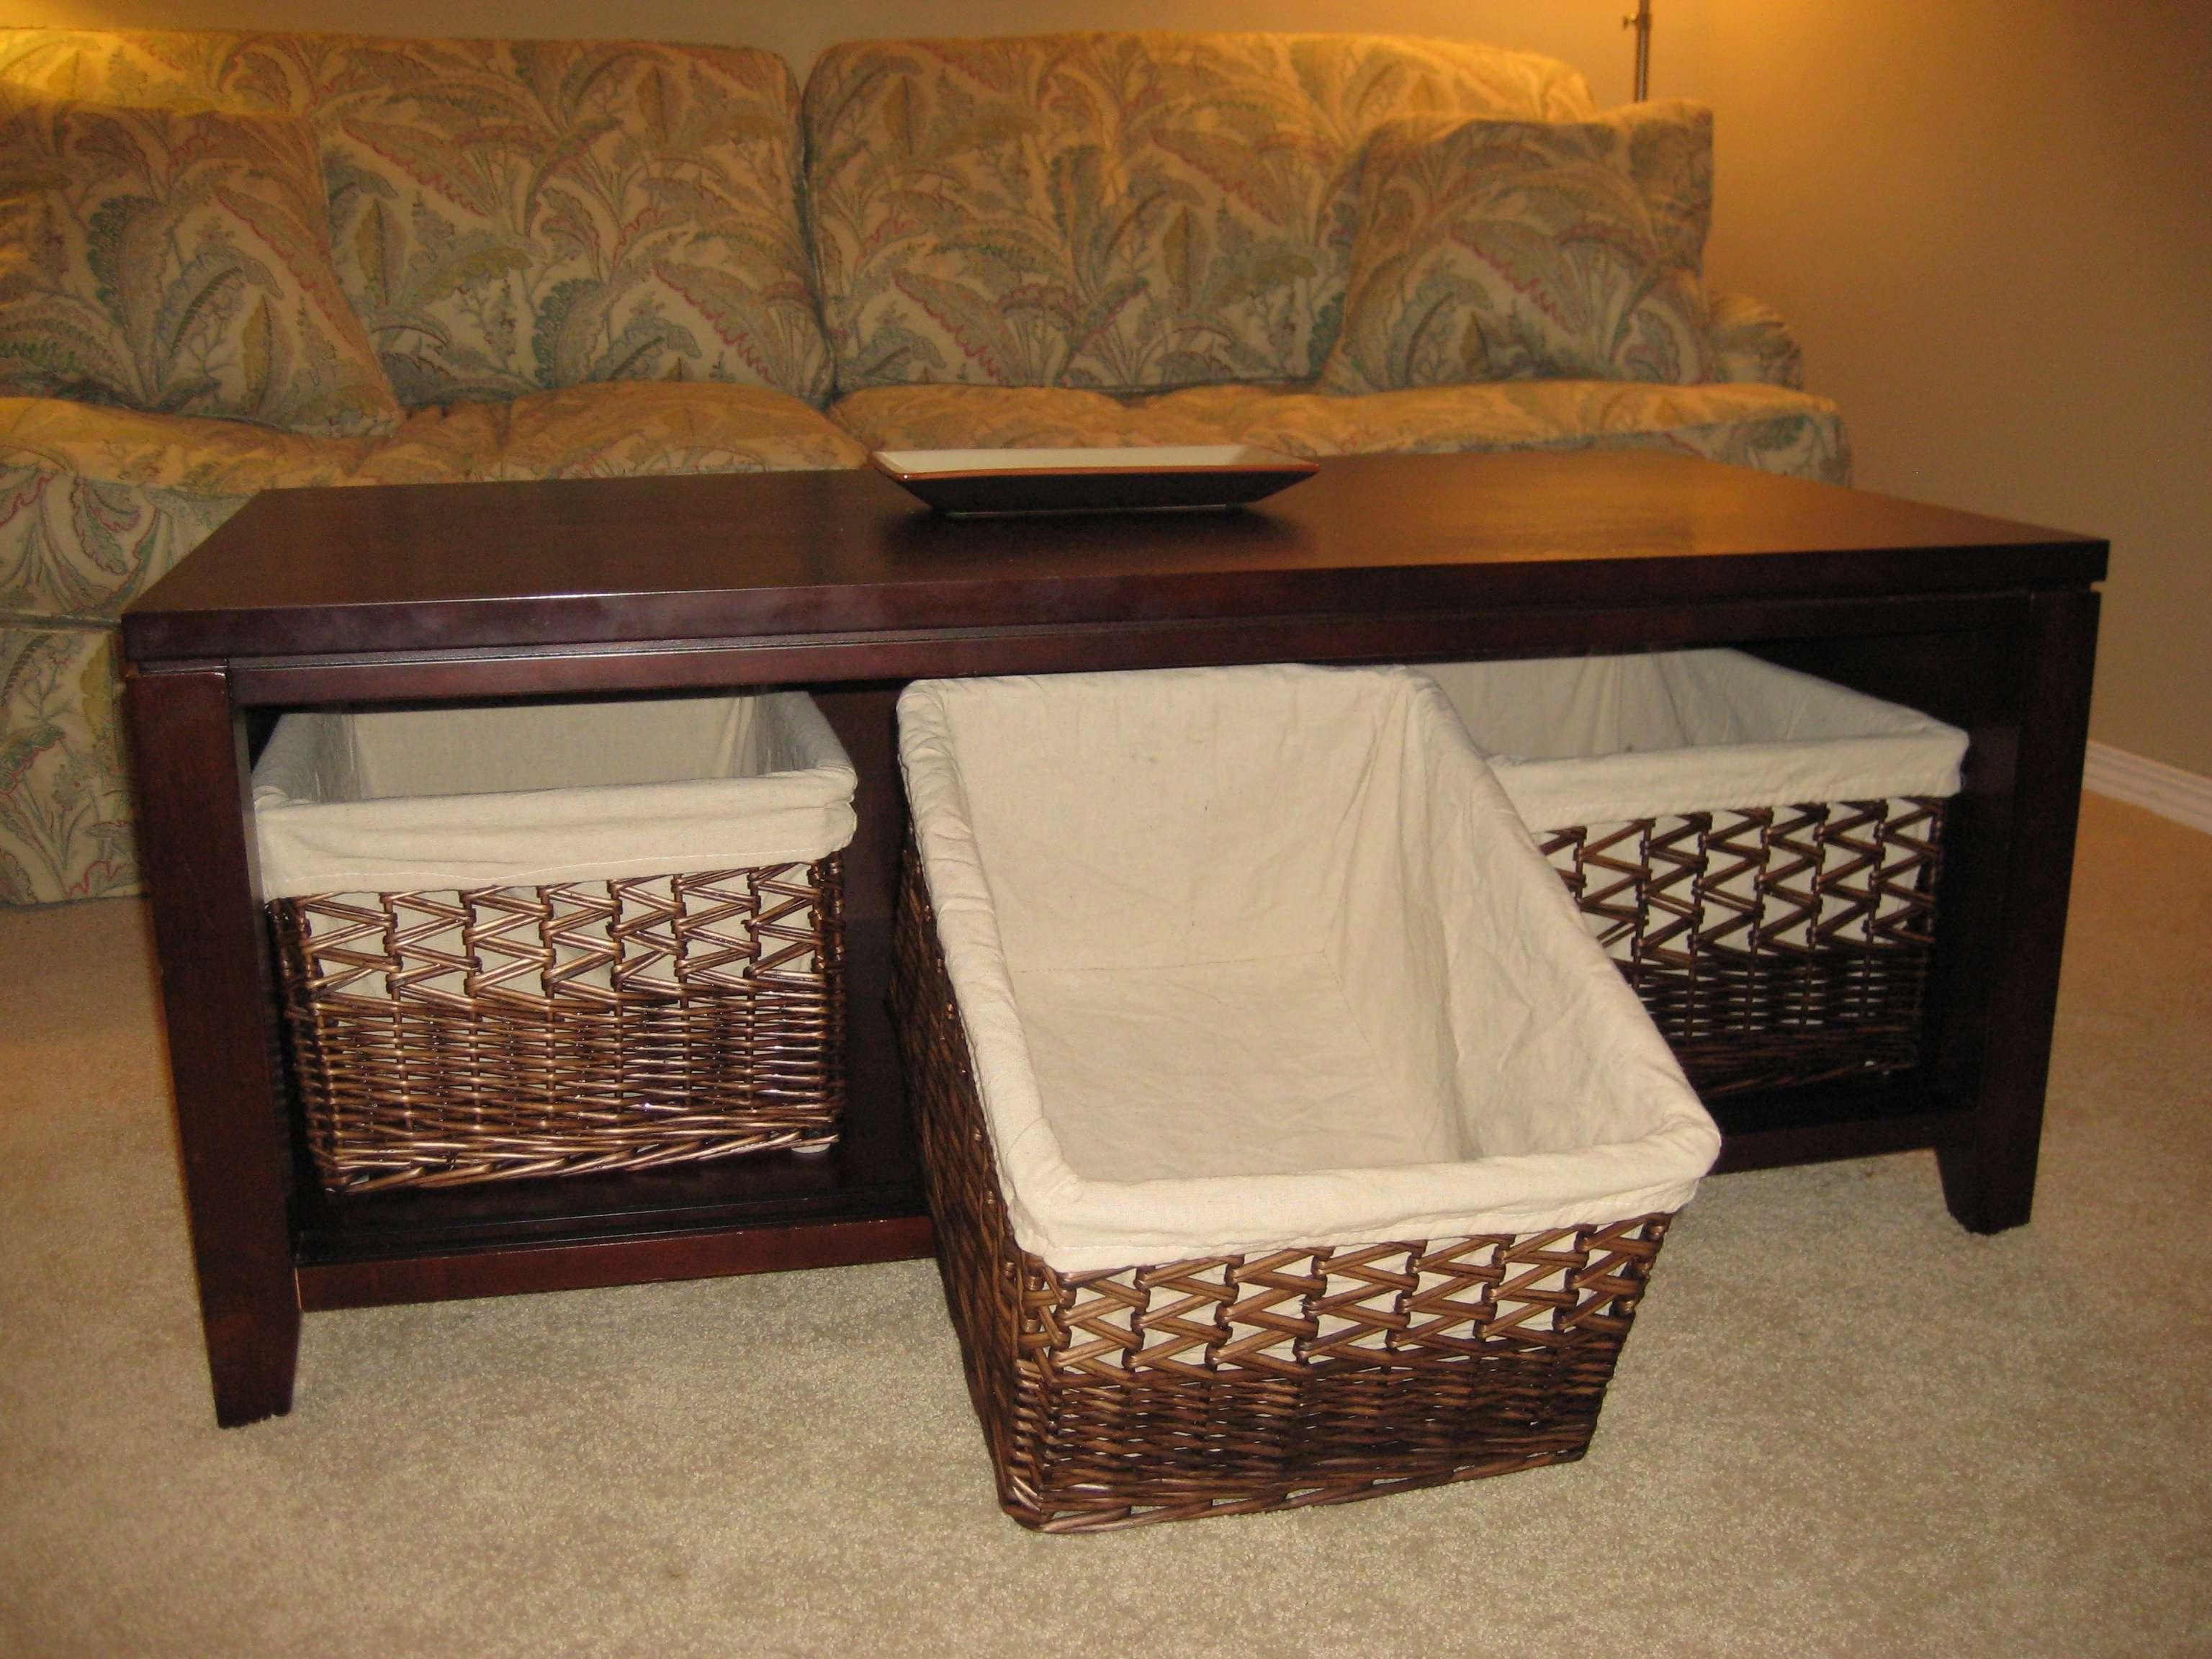 Coffee Tables With Wicker Basket Storage • Coffee Table Ideas With Most Current Coffee Table With Wicker Basket Storage (View 3 of 20)